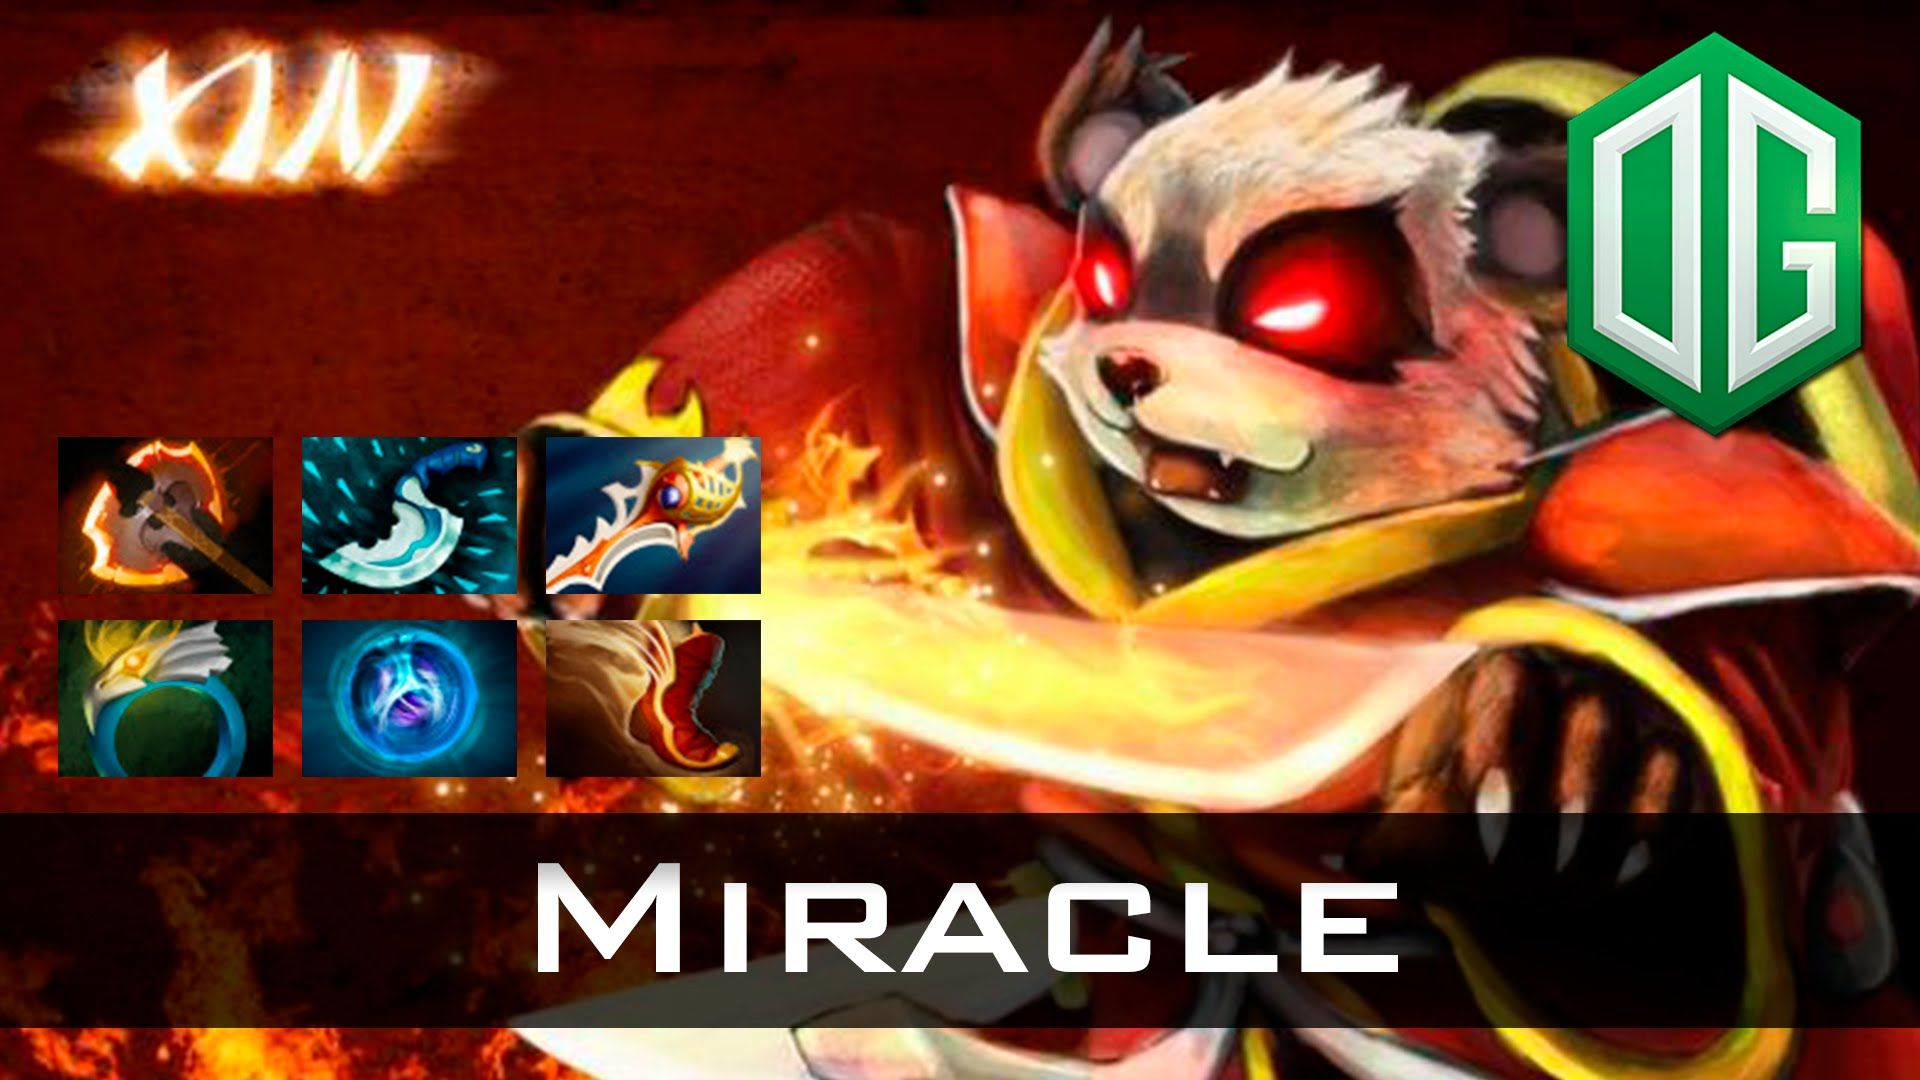 Miracle Imba Spirit - 27-0 Dota 2 Gameplay http://bountyhunts.blogspot.com/2016/06/miracle-imba-spirit-27-0-dota-2-gameplay.html